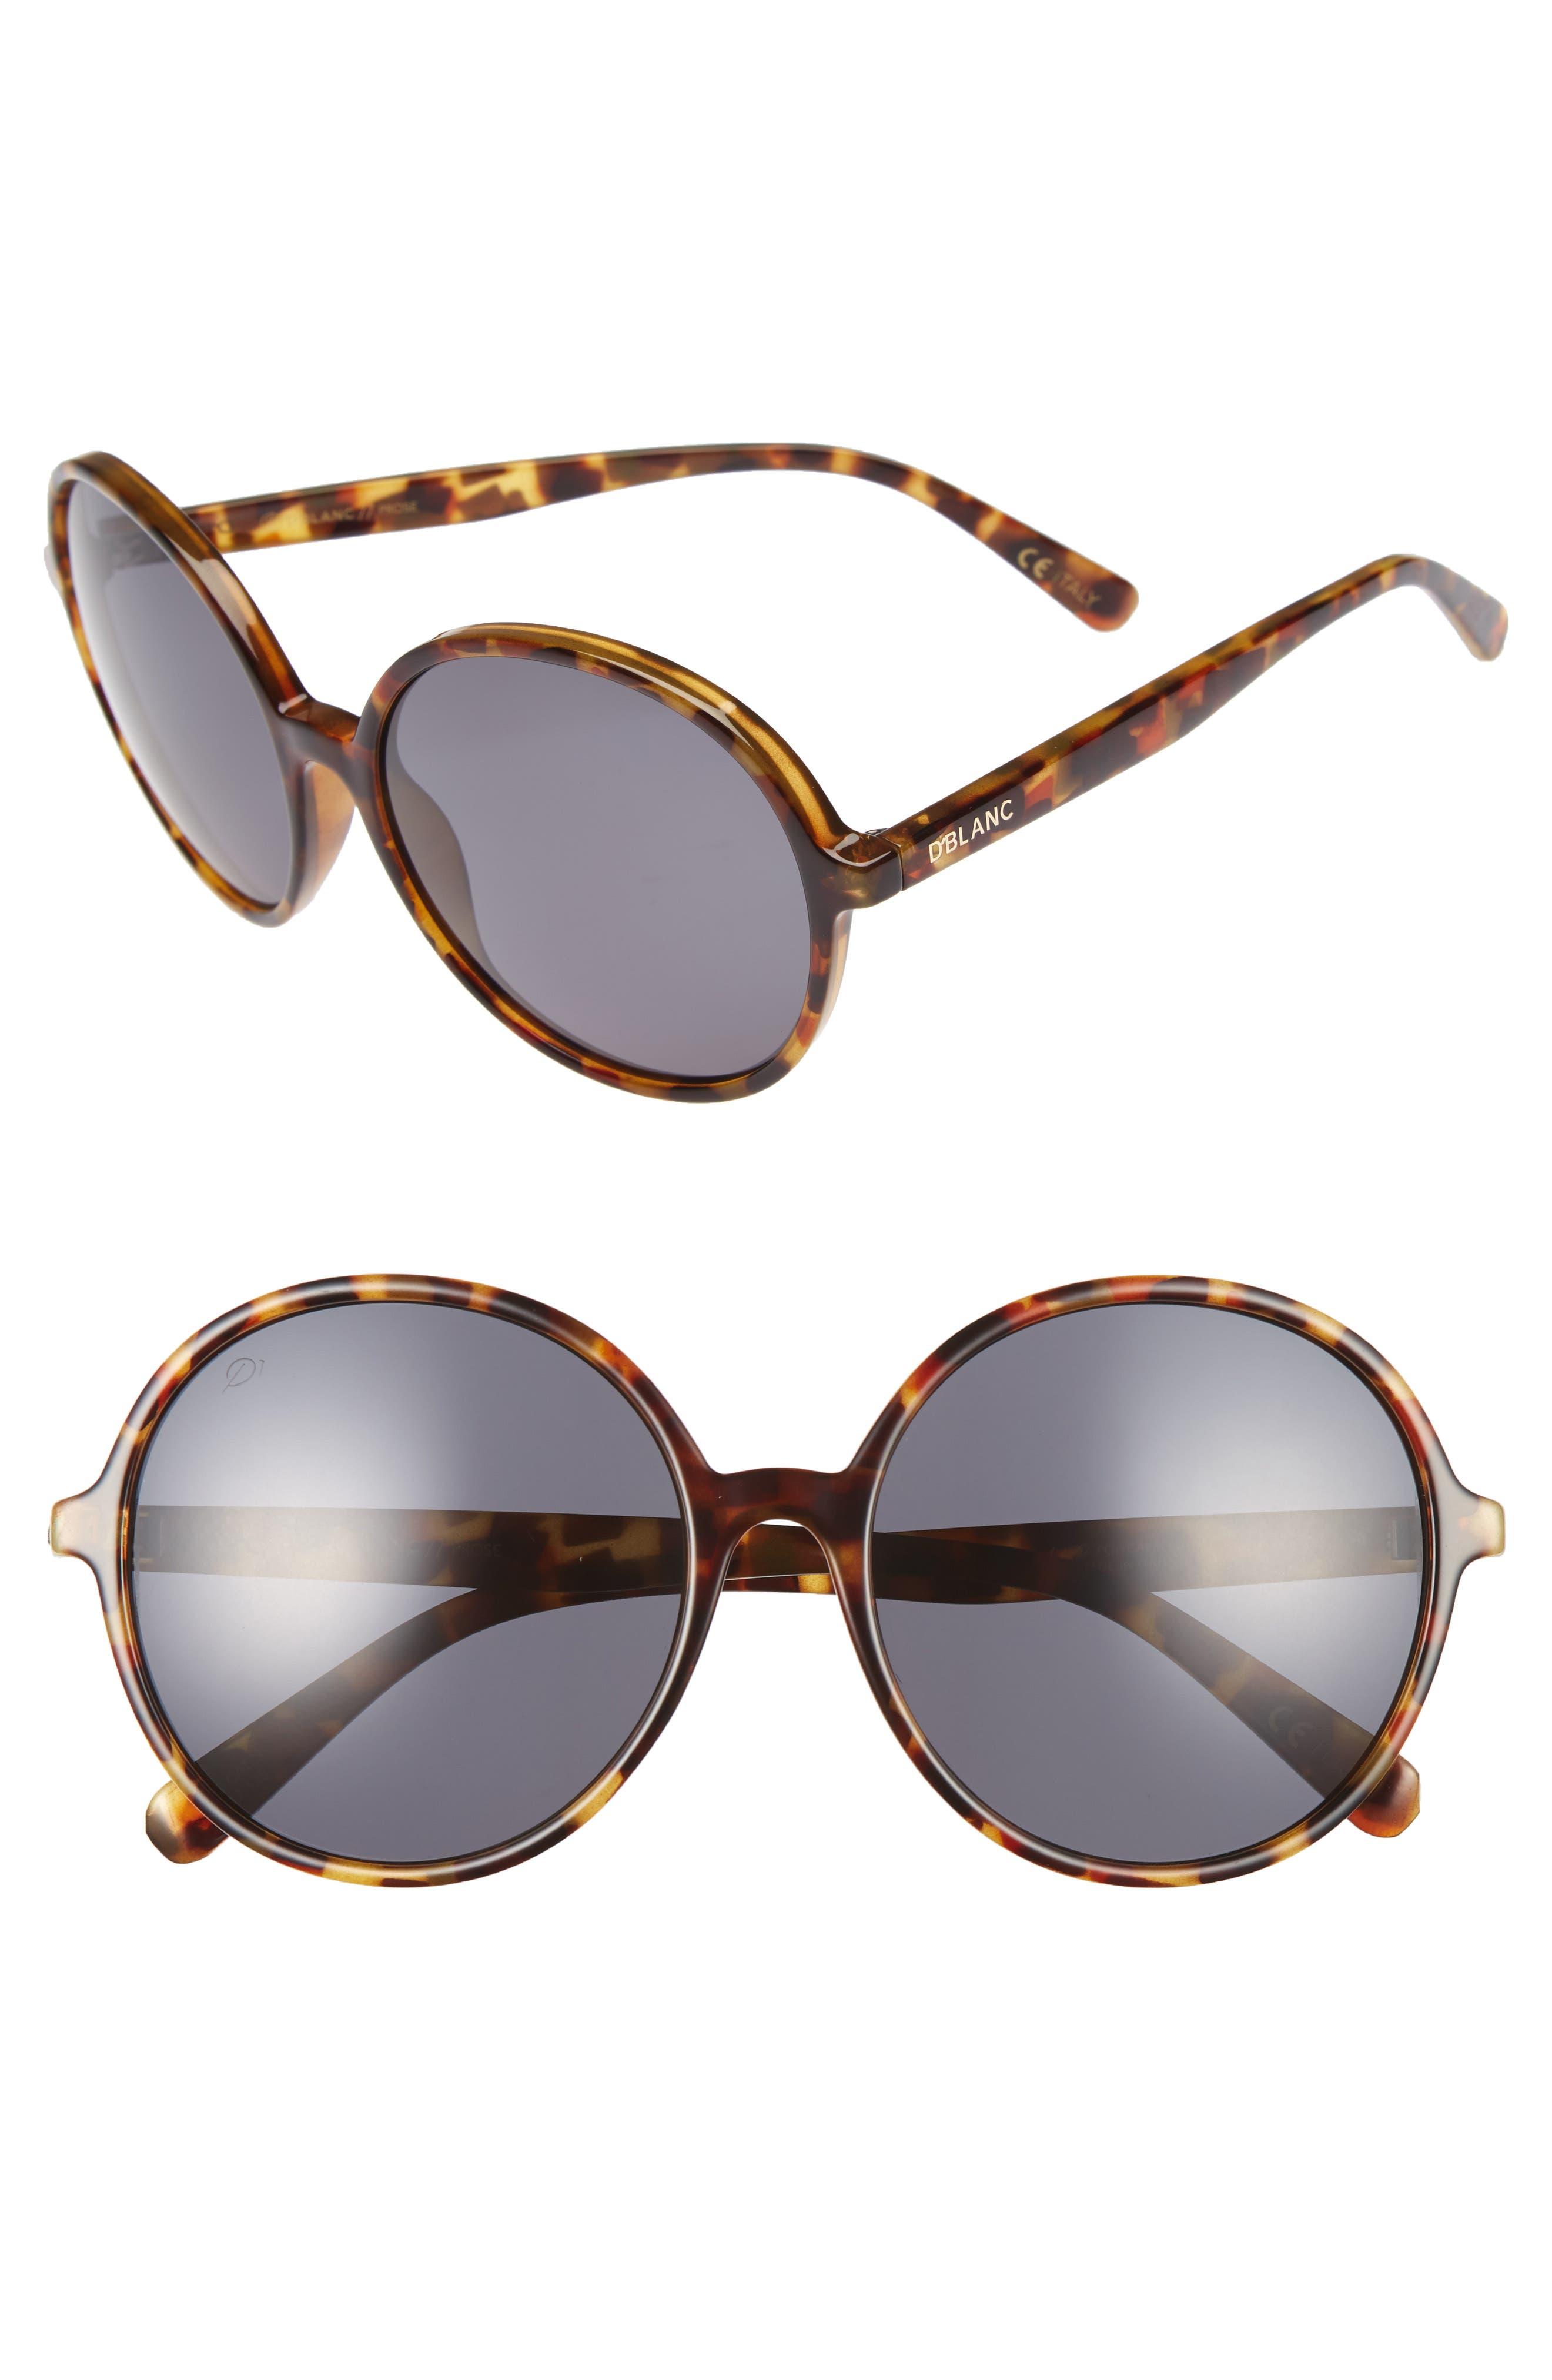 D'BLANC Prose 59mm Round Sunglasses